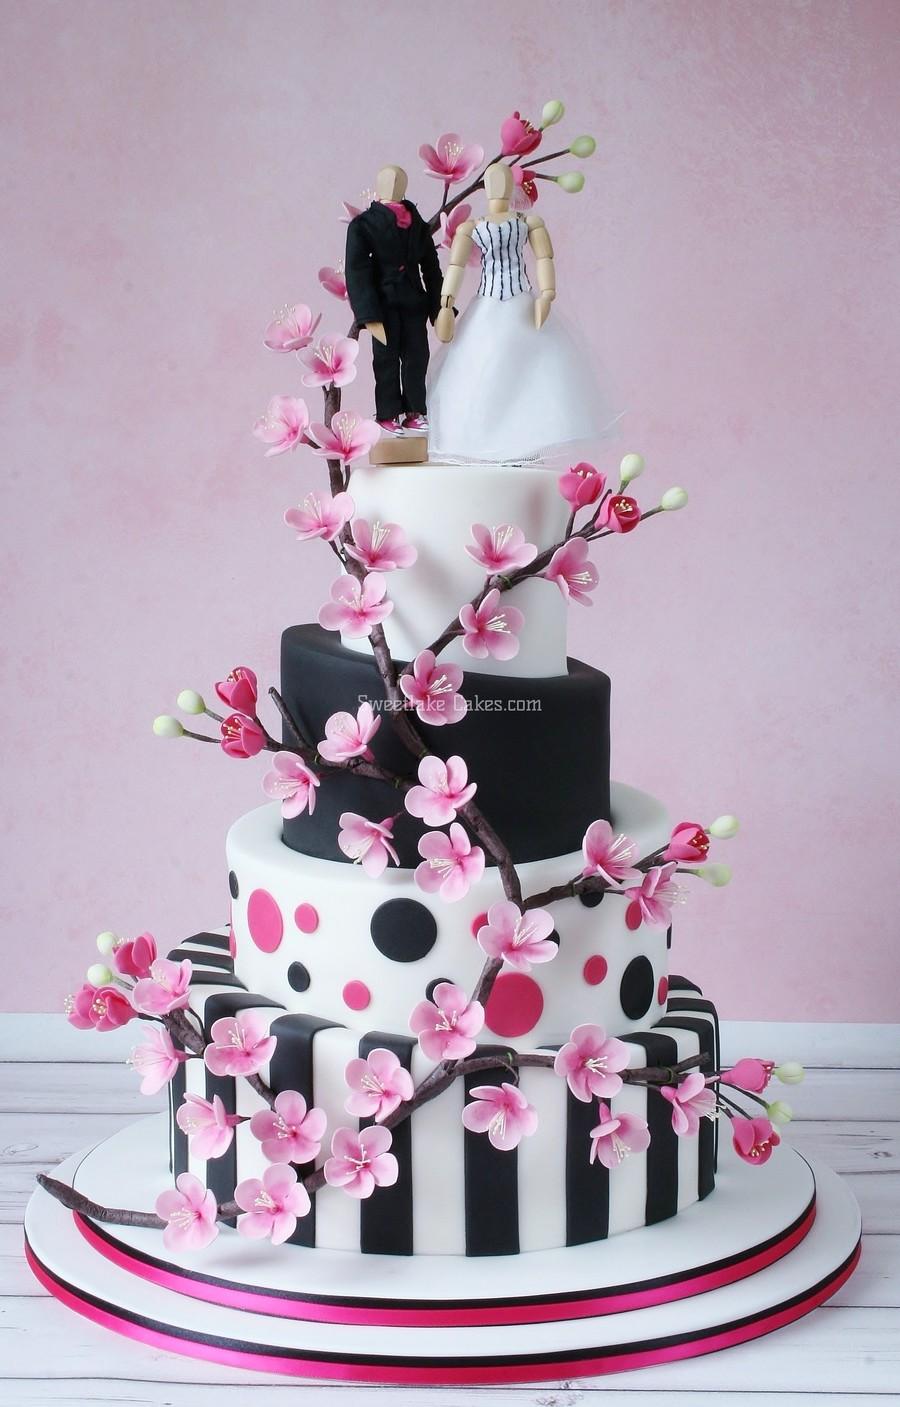 Cherry Blossom Topsy Turvy Wedding Cake - CakeCentral.com